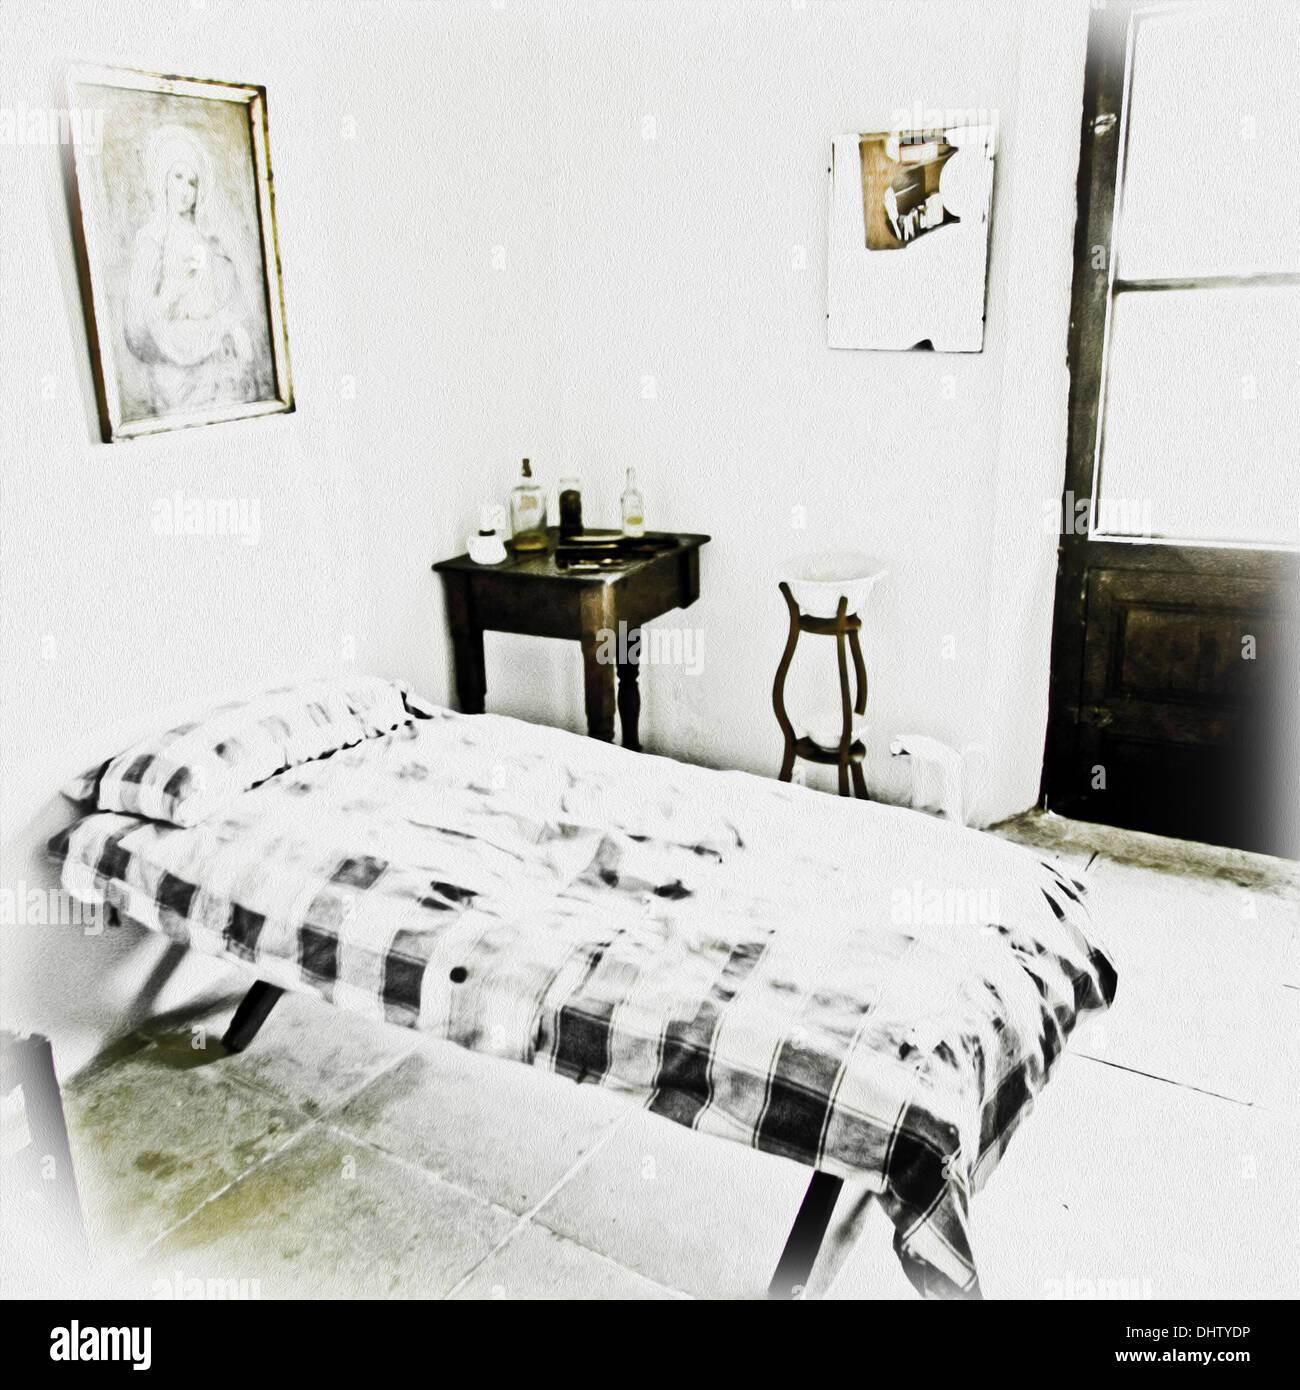 servants' room - Stock Image